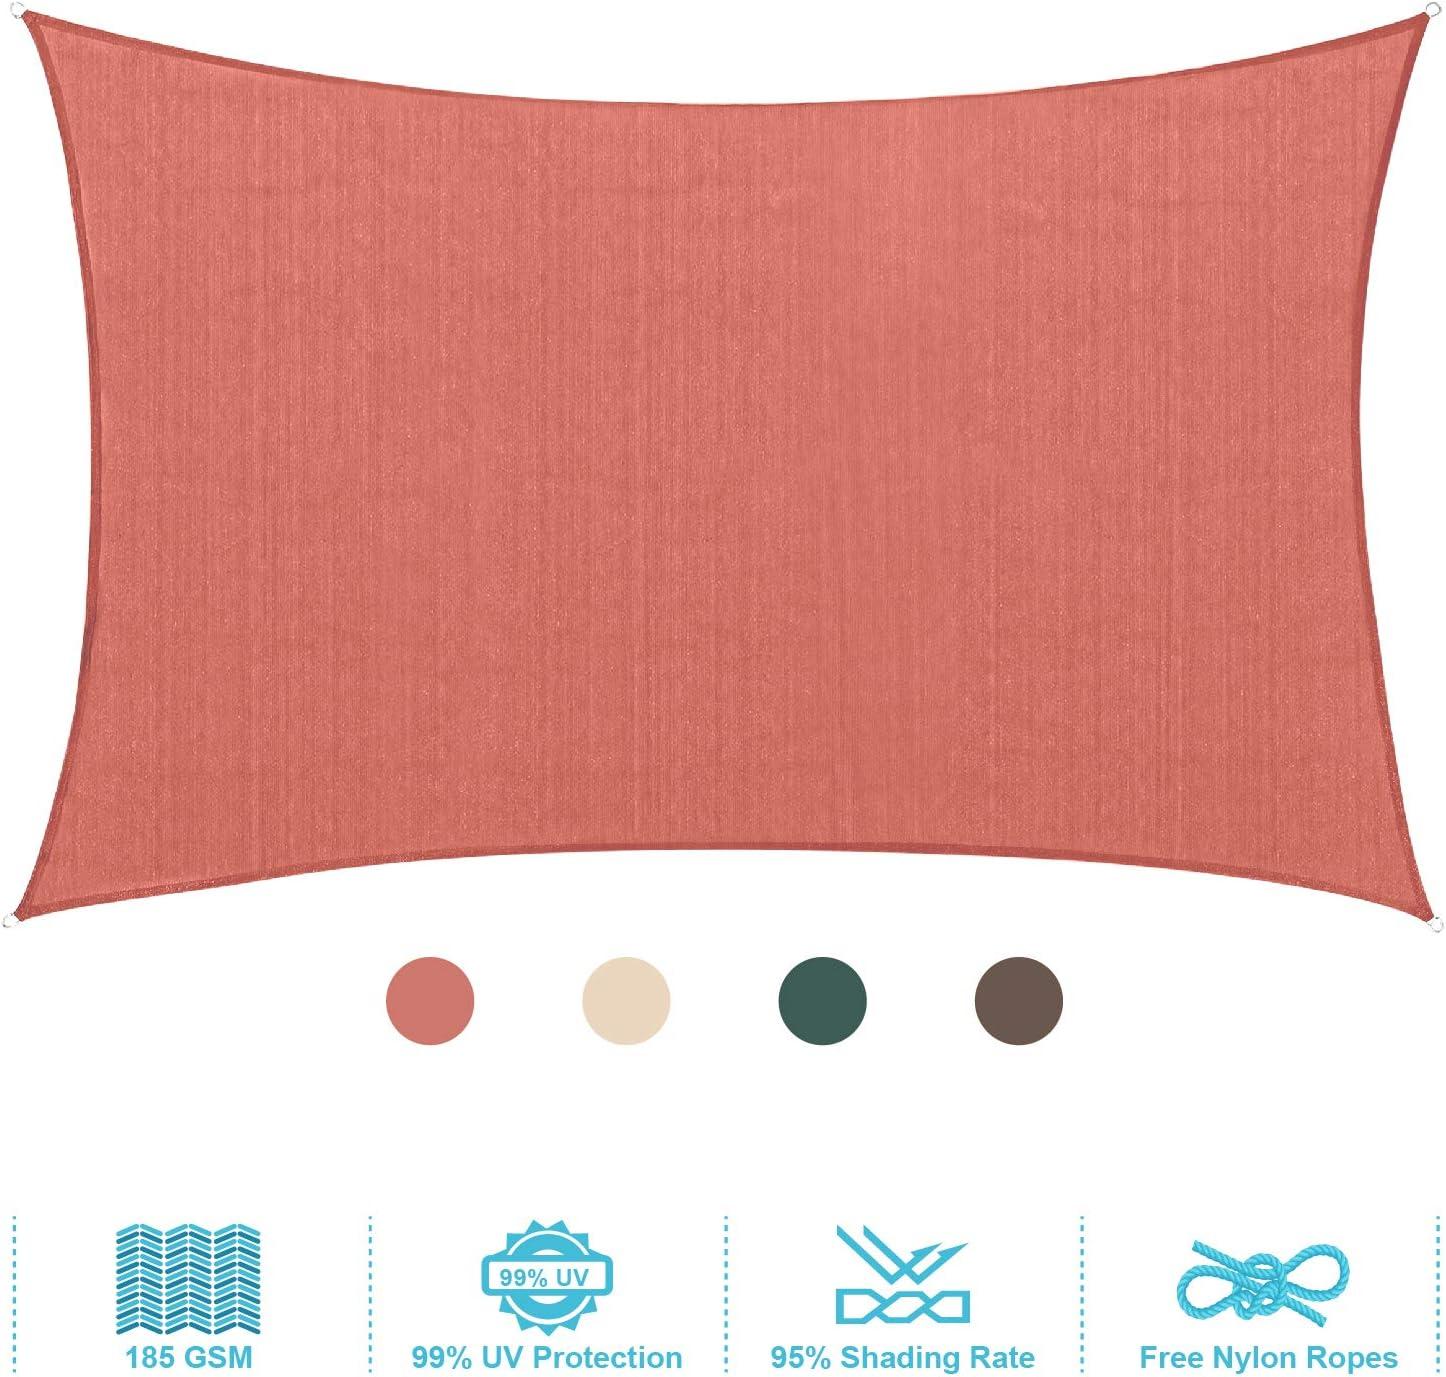 PHI VILLA Sun Shade Sail Rectangle 12'x16' Terra Cotta Patio Canopy Cover - UV Bloack - for Patio, Garden, Yard, Pergola